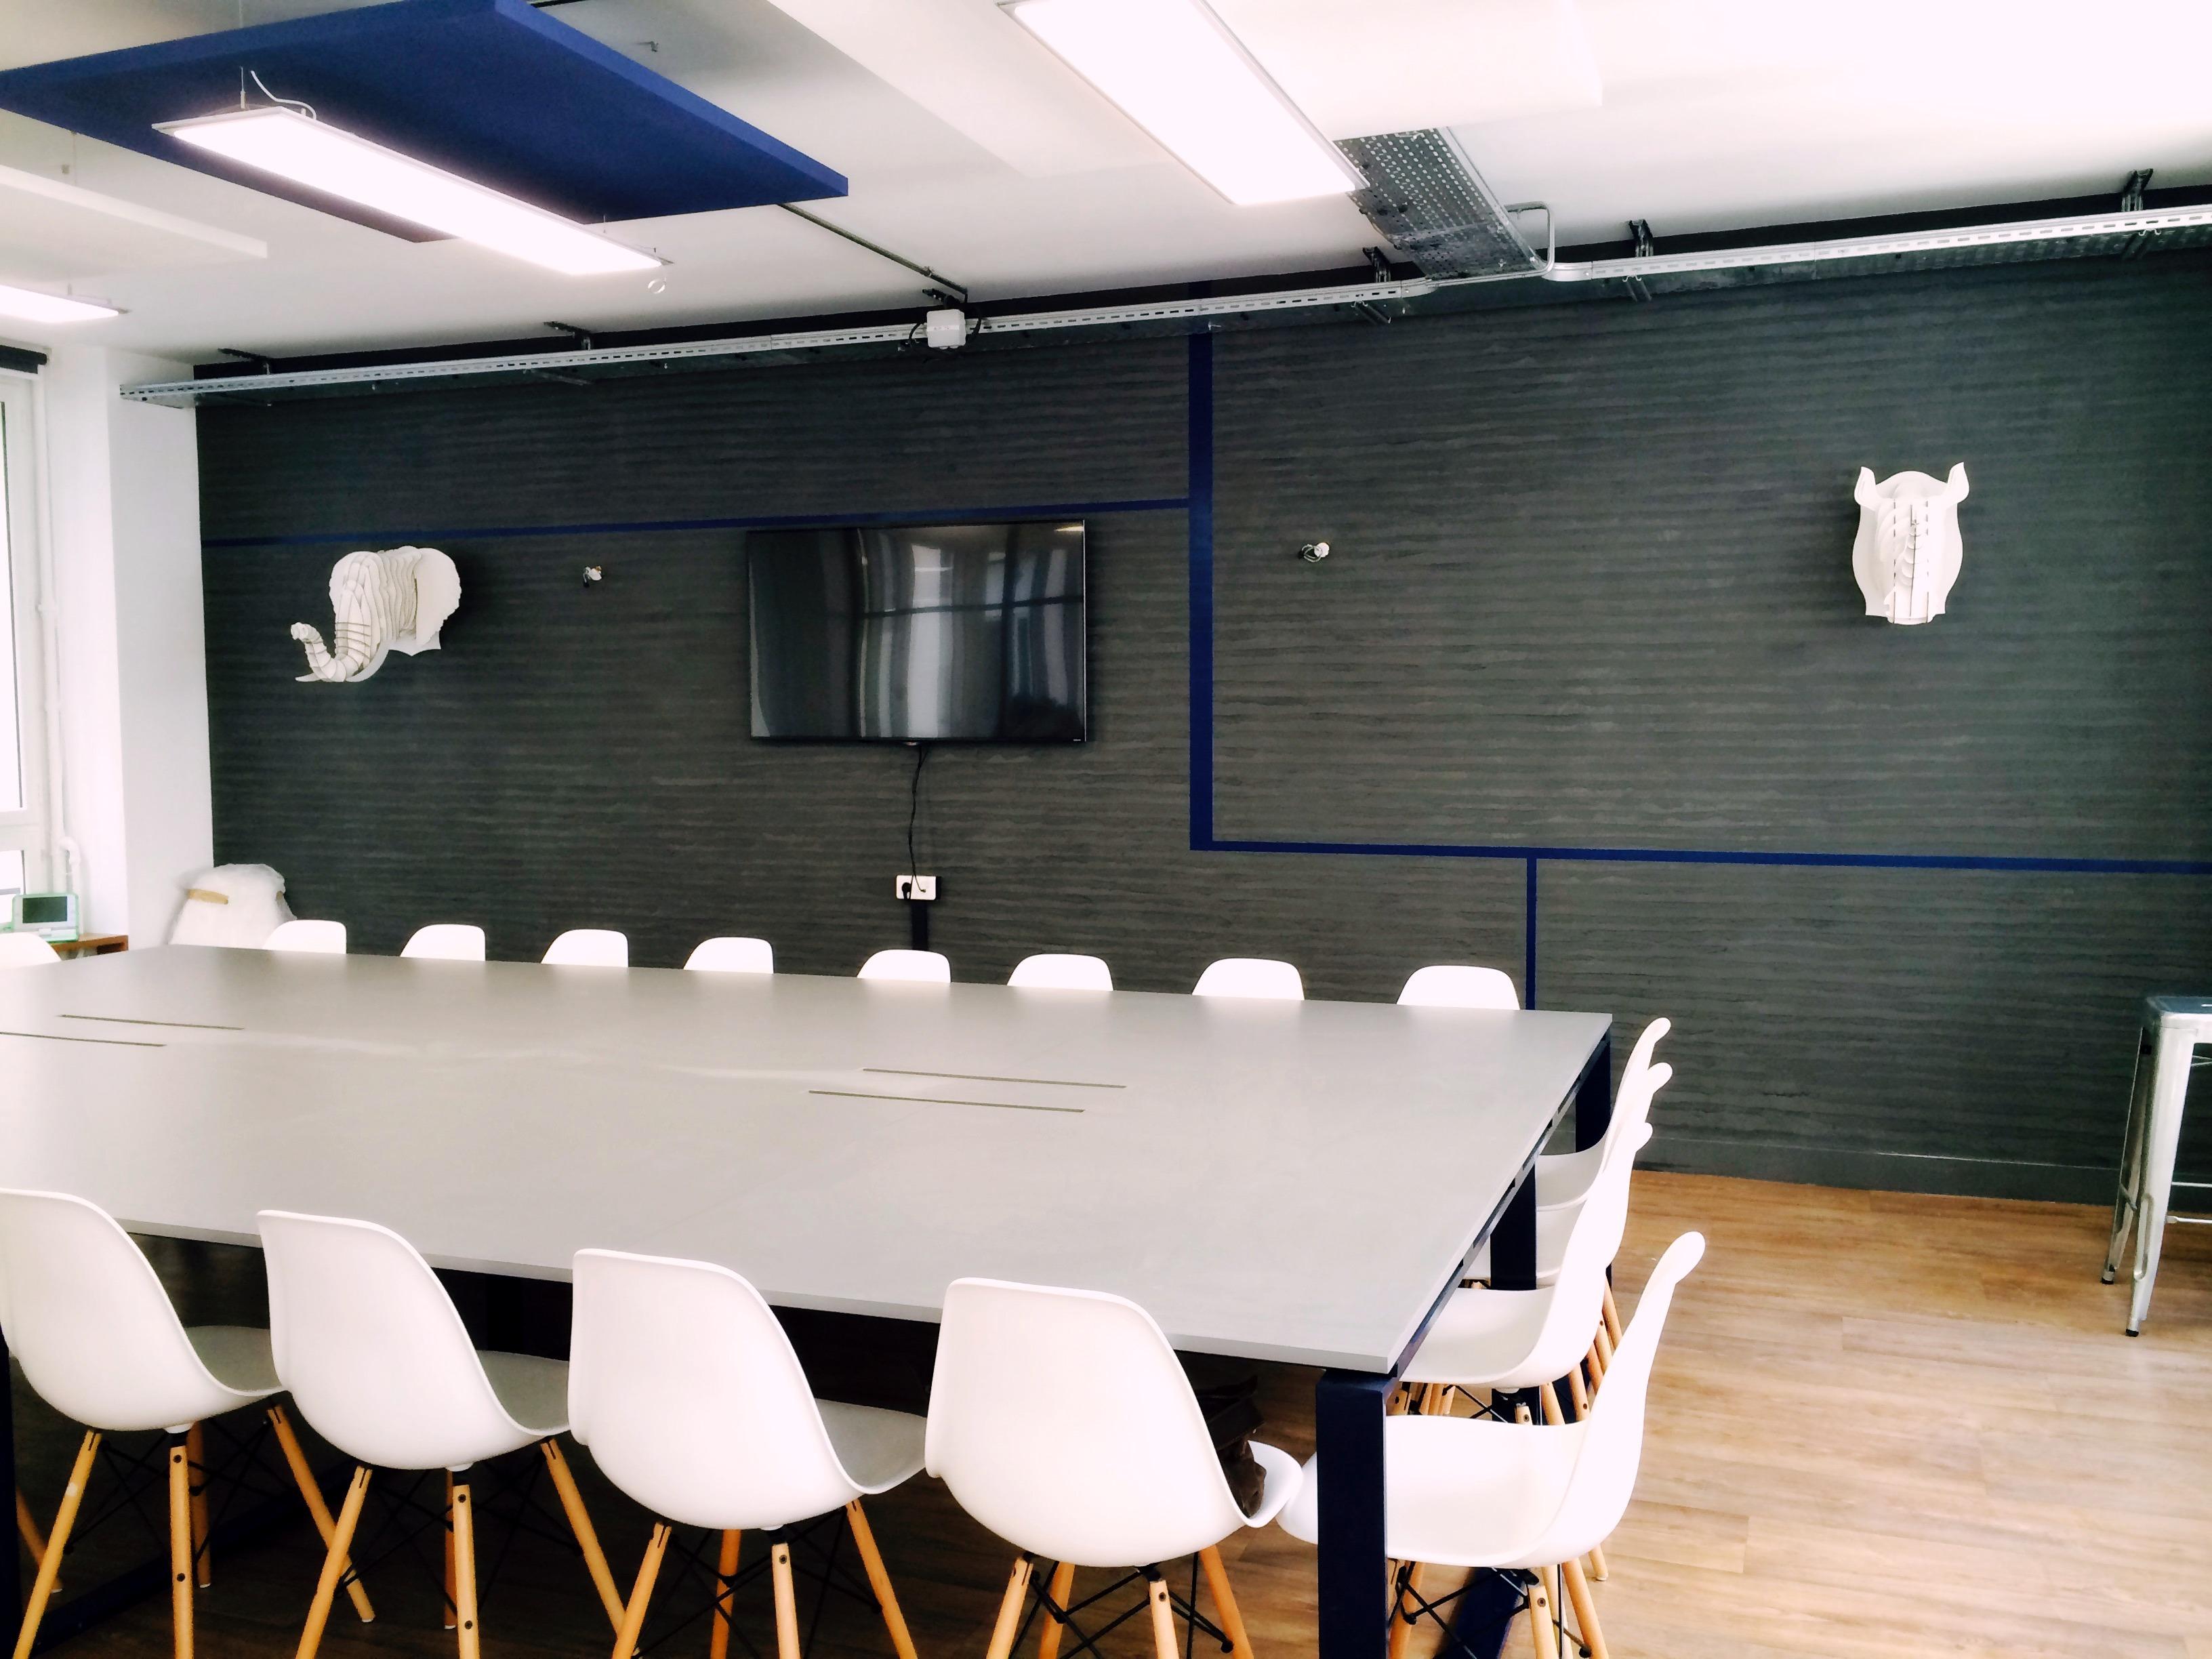 Bureau Salle de réunion Atelier2c.fr